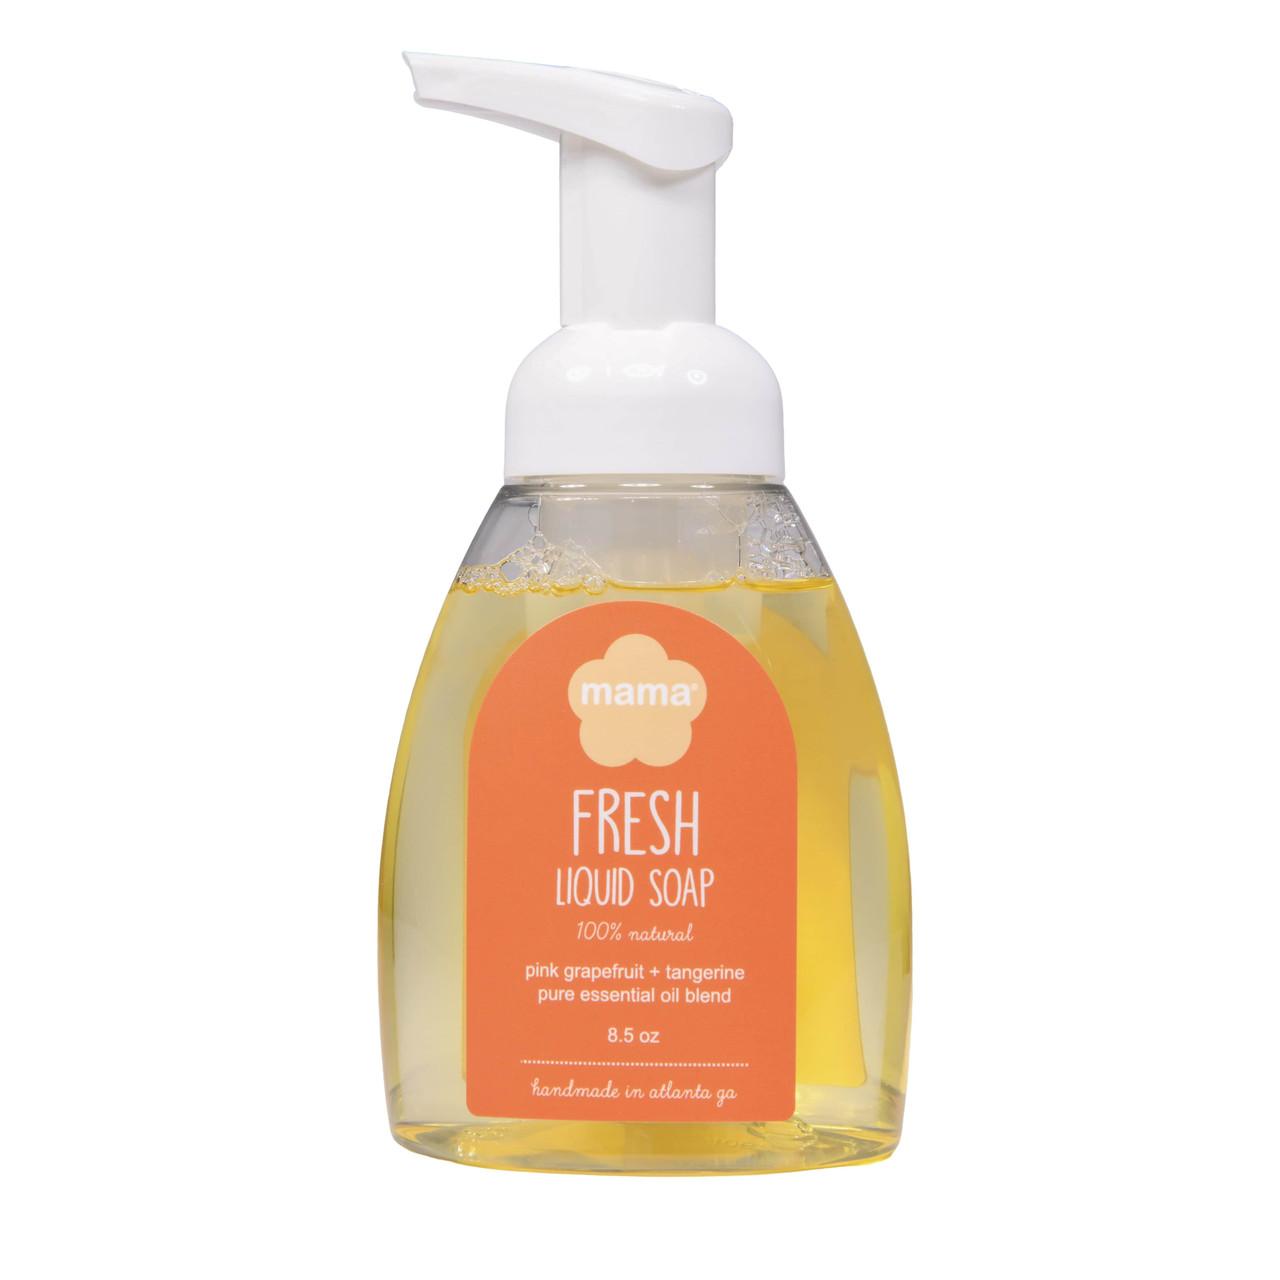 Fresh (Grapefruit + Tangerine) Liquid Soap | Mama Bath + Body